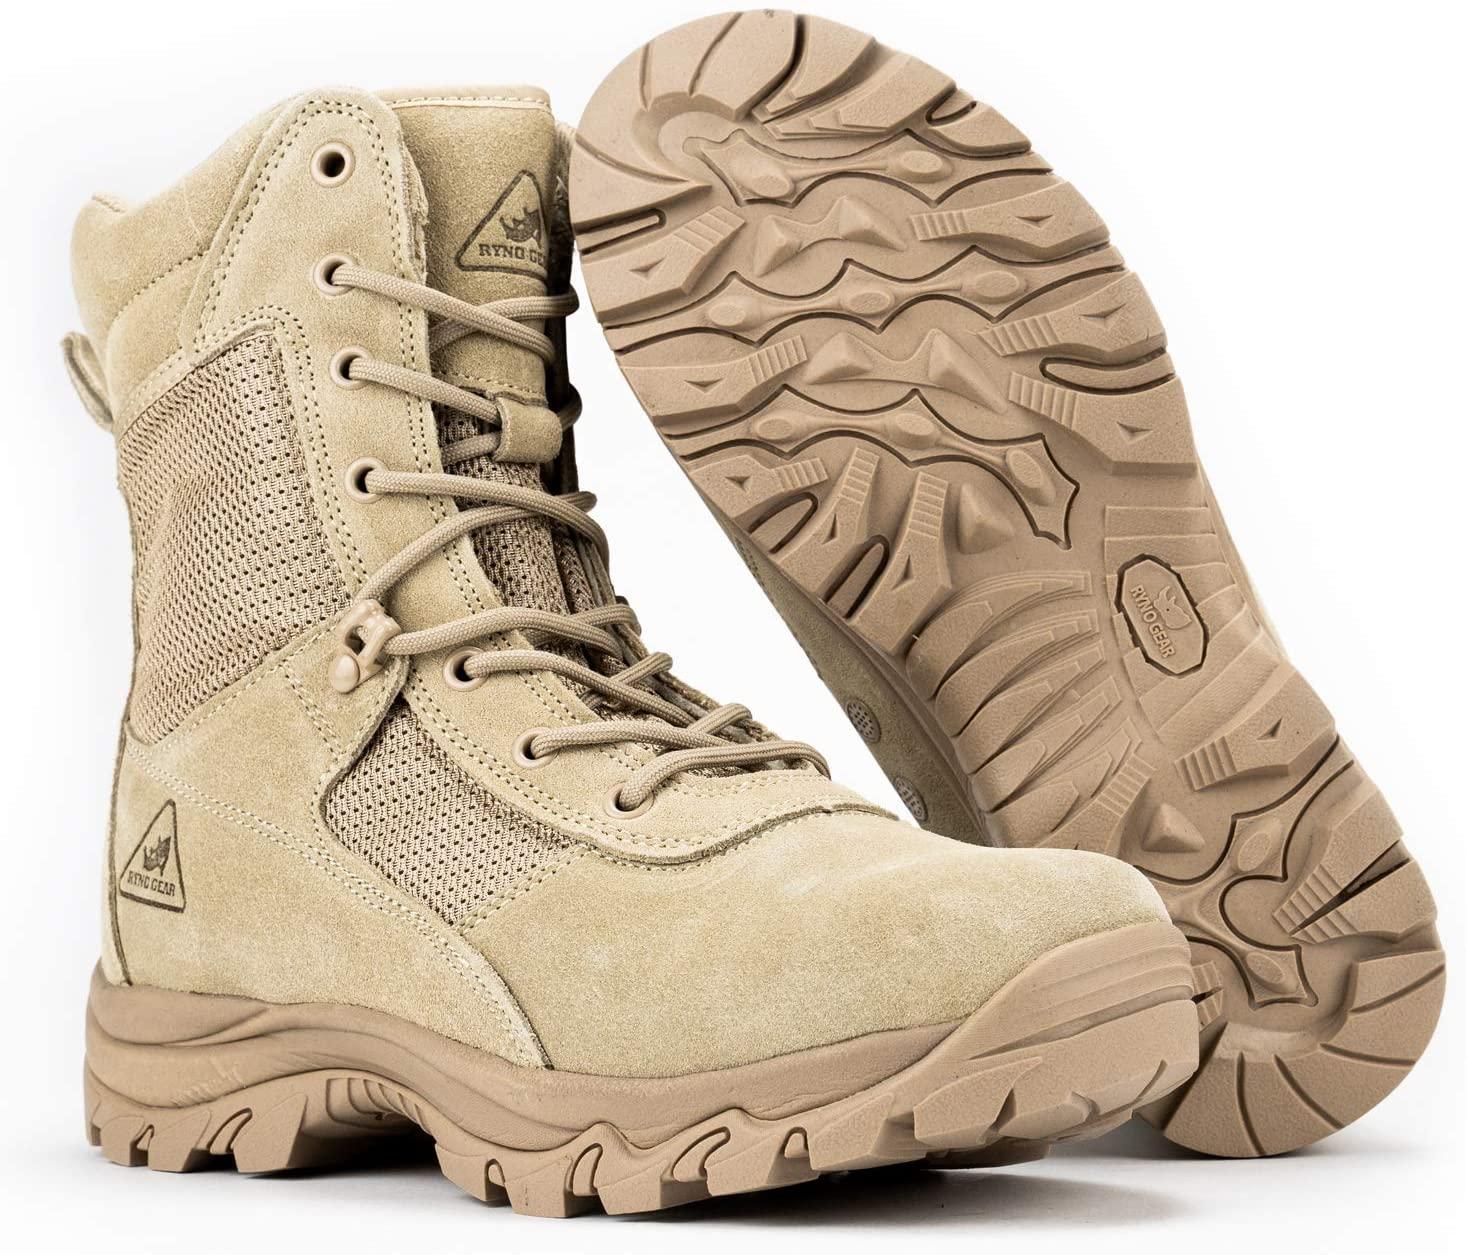 RYNO GEAR Combat Boots